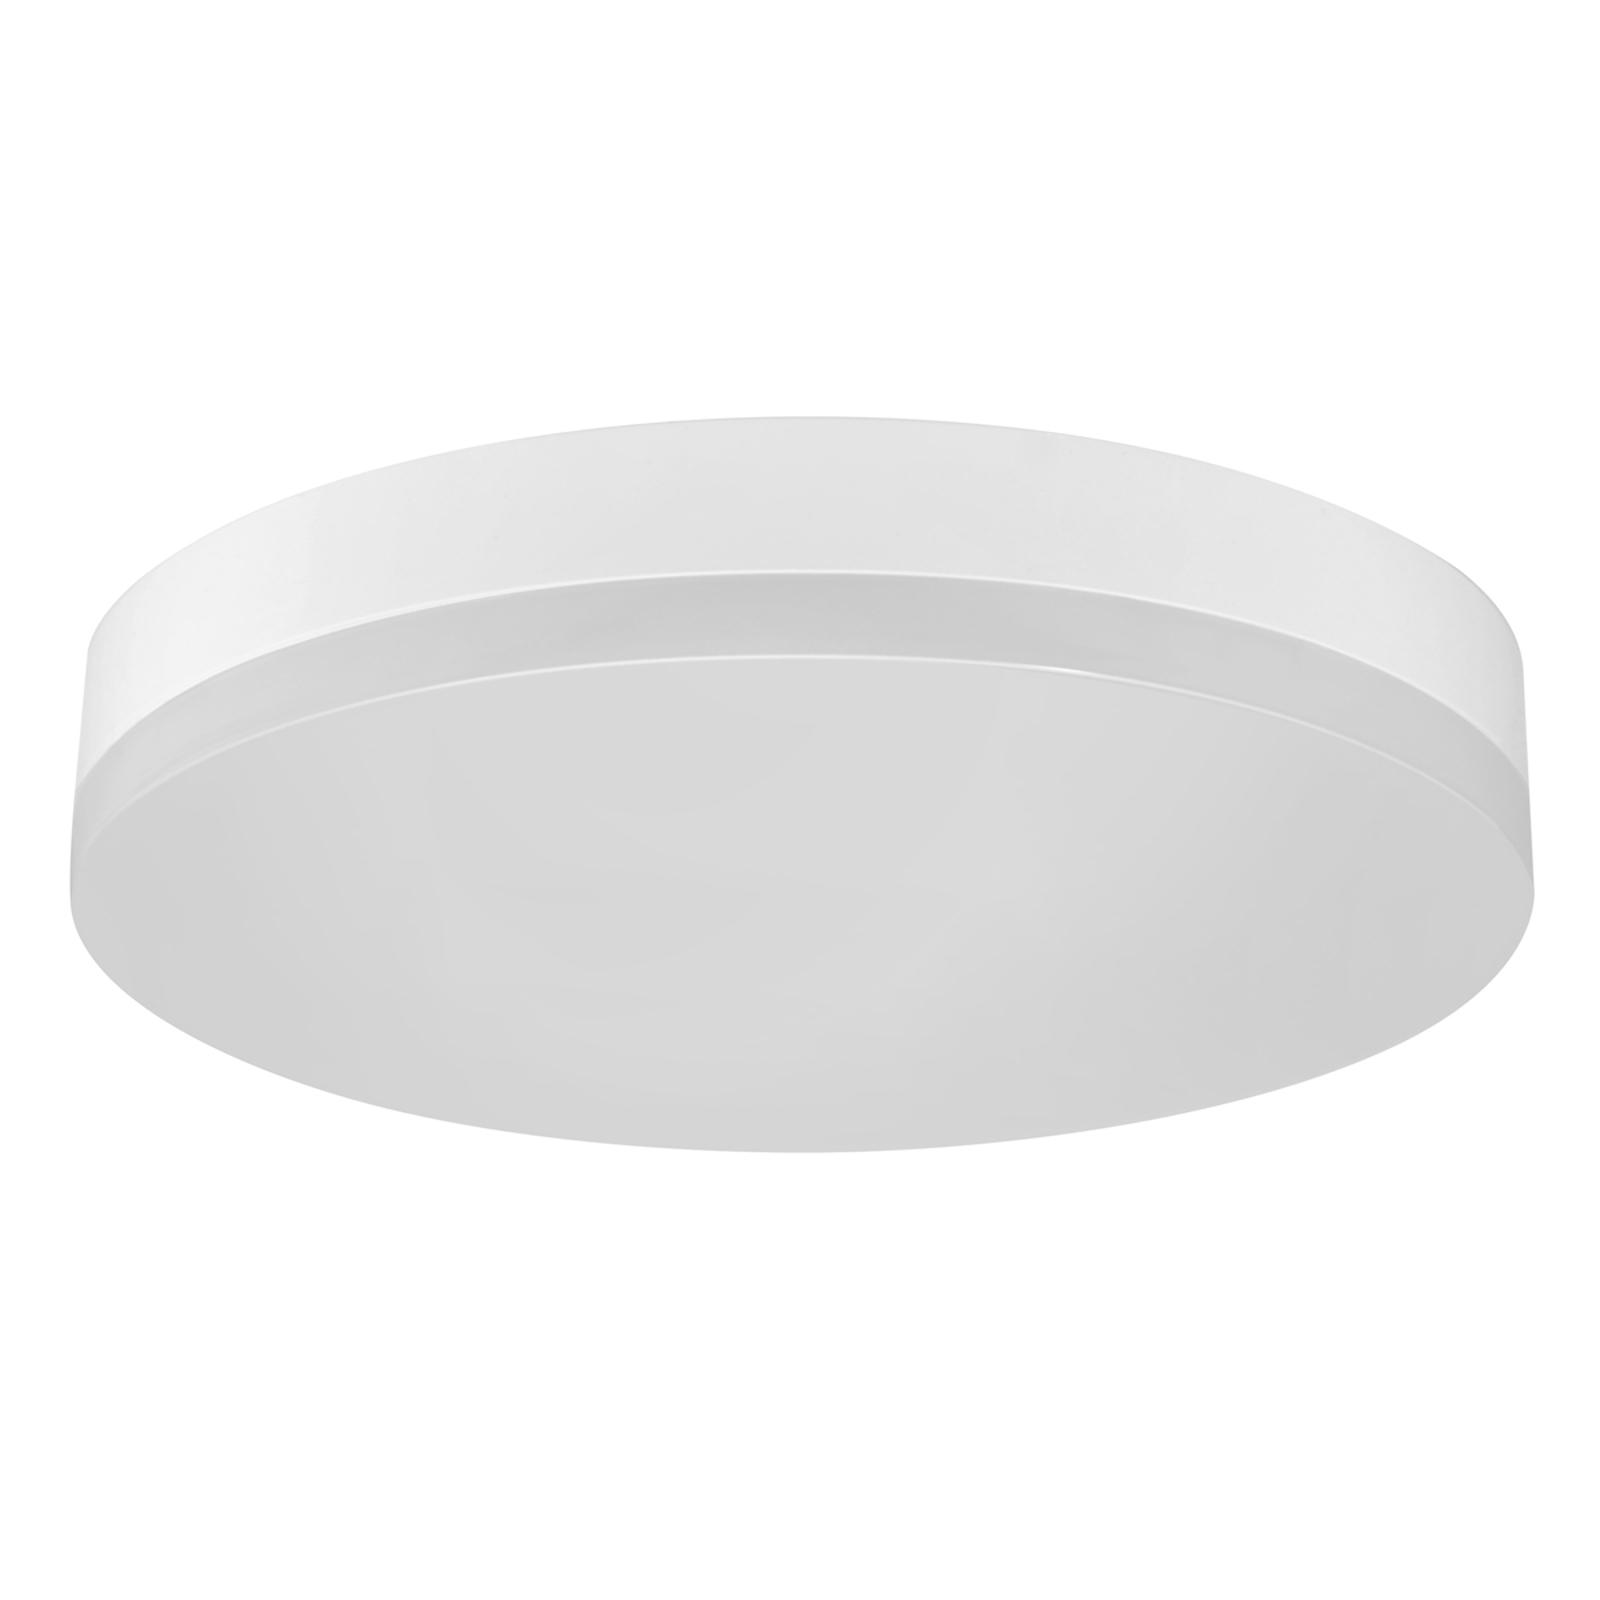 Office Round - LED ceiling light IP44, warm white_8559228_1